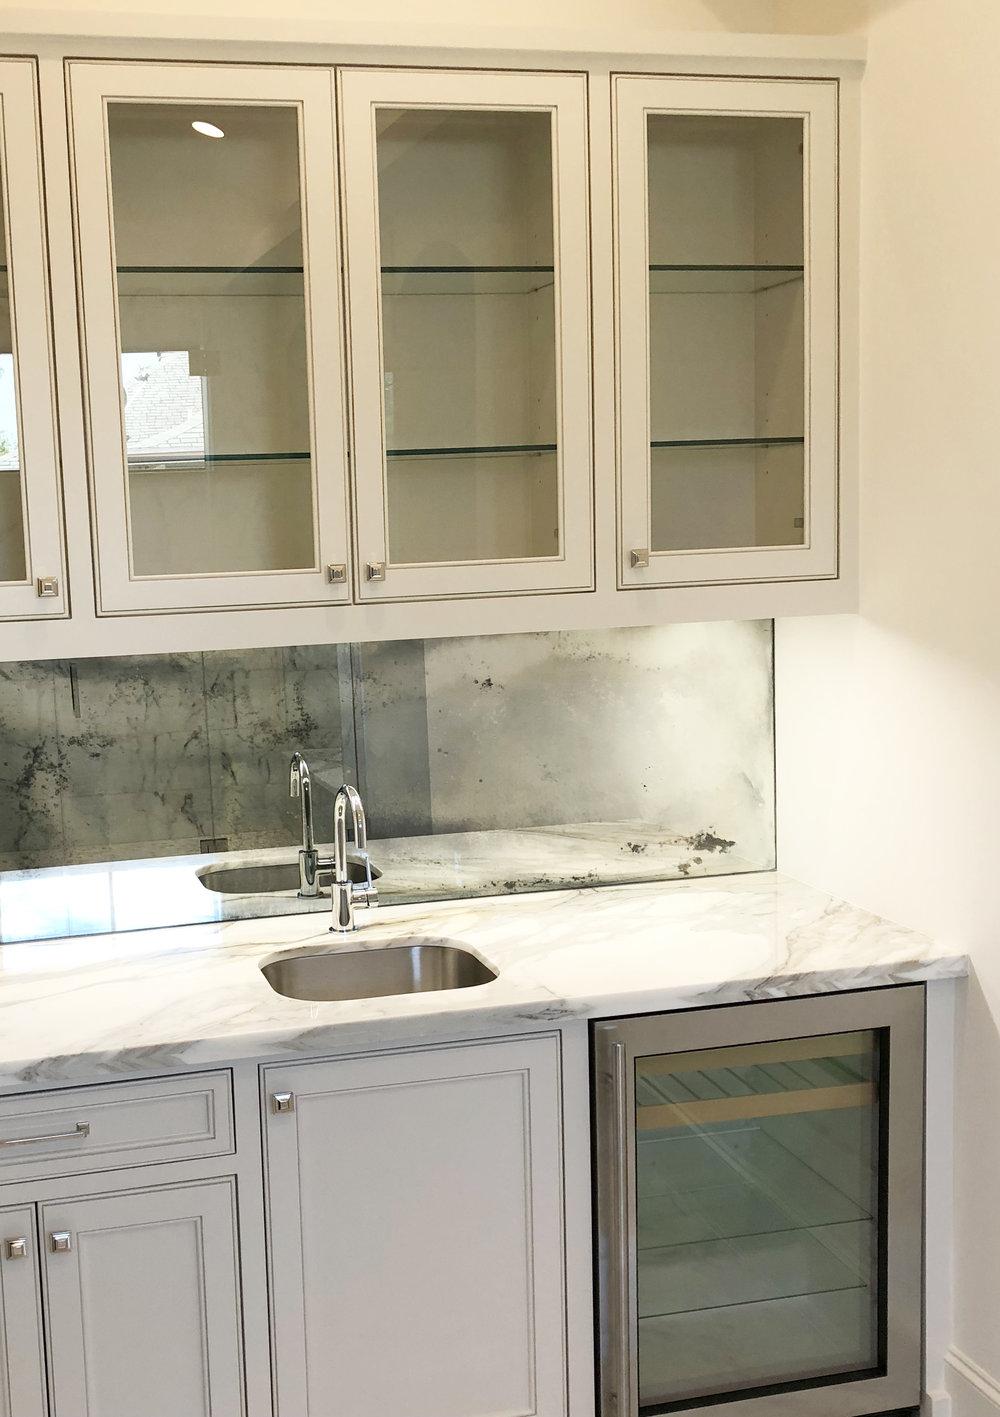 Master Suite wetbar with antique mirror backsplash designed by Berlin interior designer Jamie House. Jamie House Design. Built by CM Batts Developers.